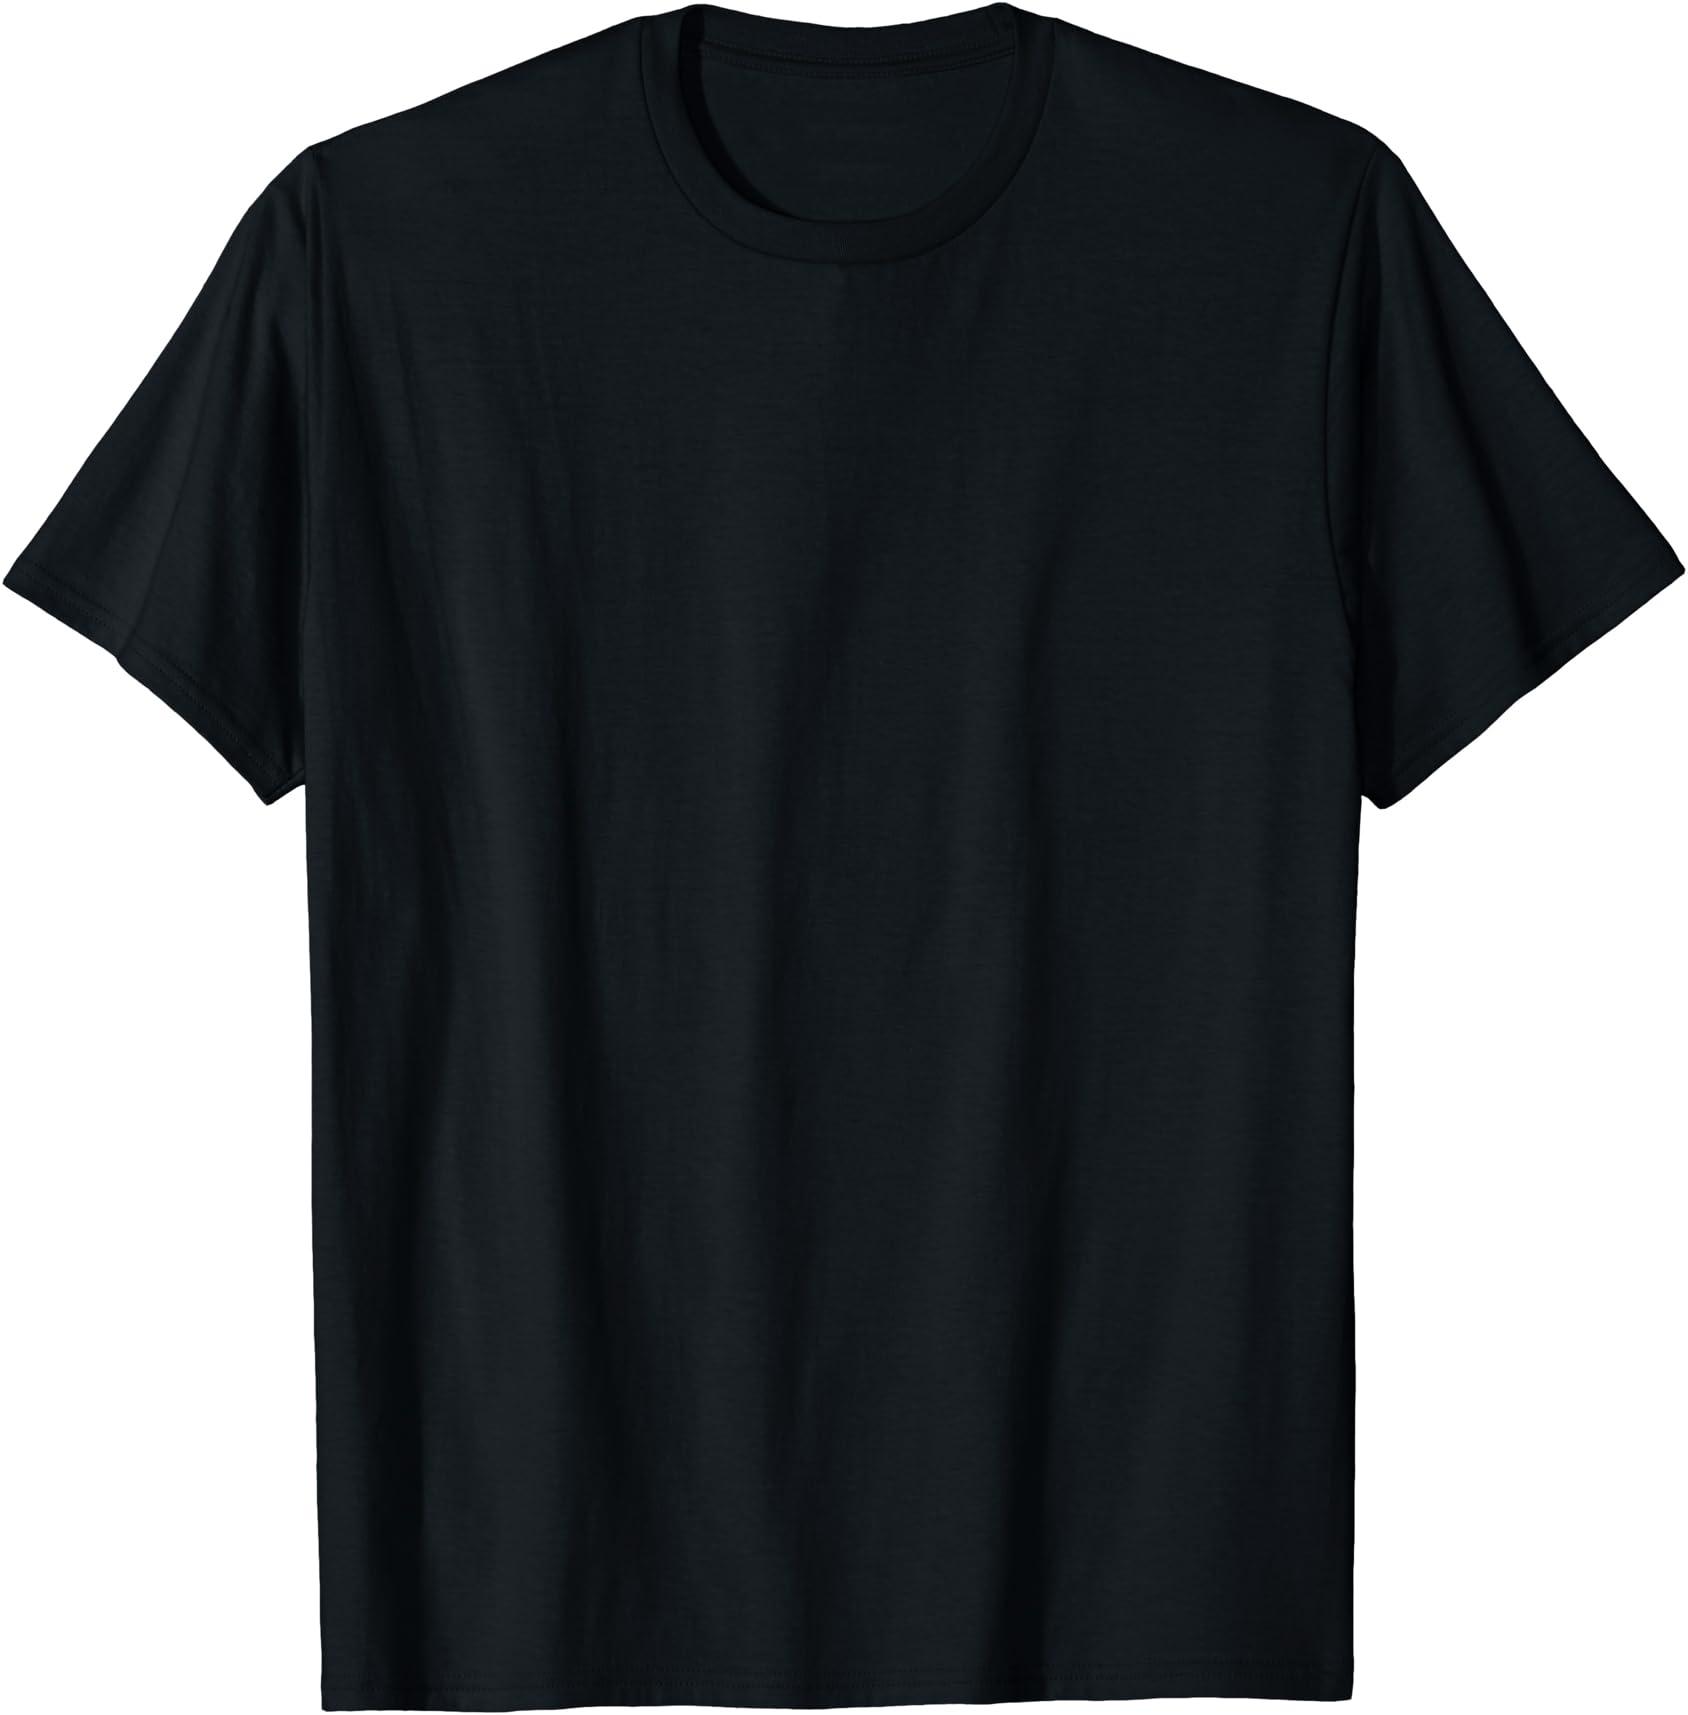 This Is My Handstand Shirt Gymnastics Cute Kids Sweatshirt Gift Idea